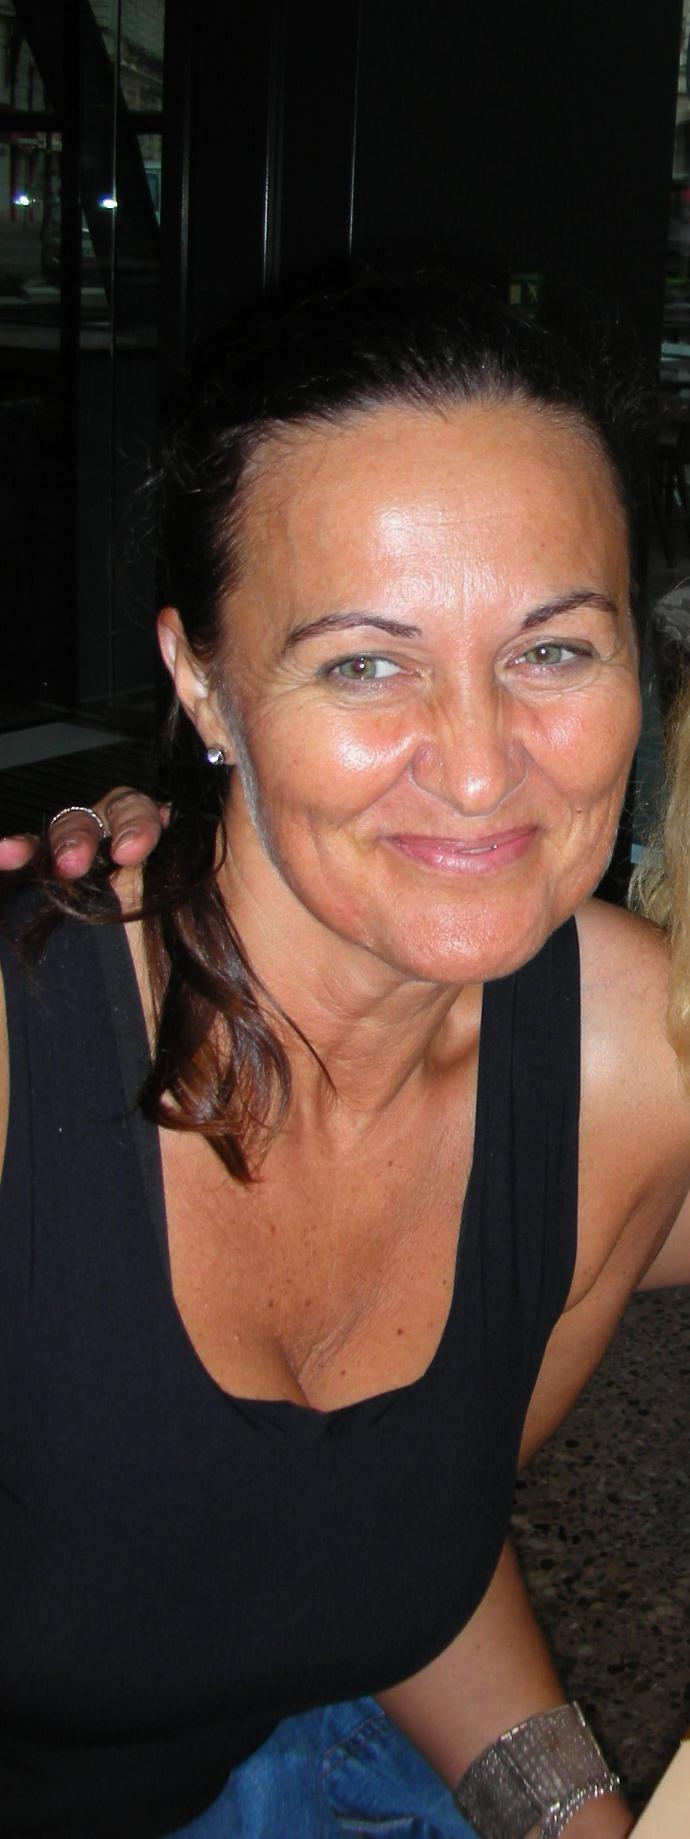 Böröczky Katalin